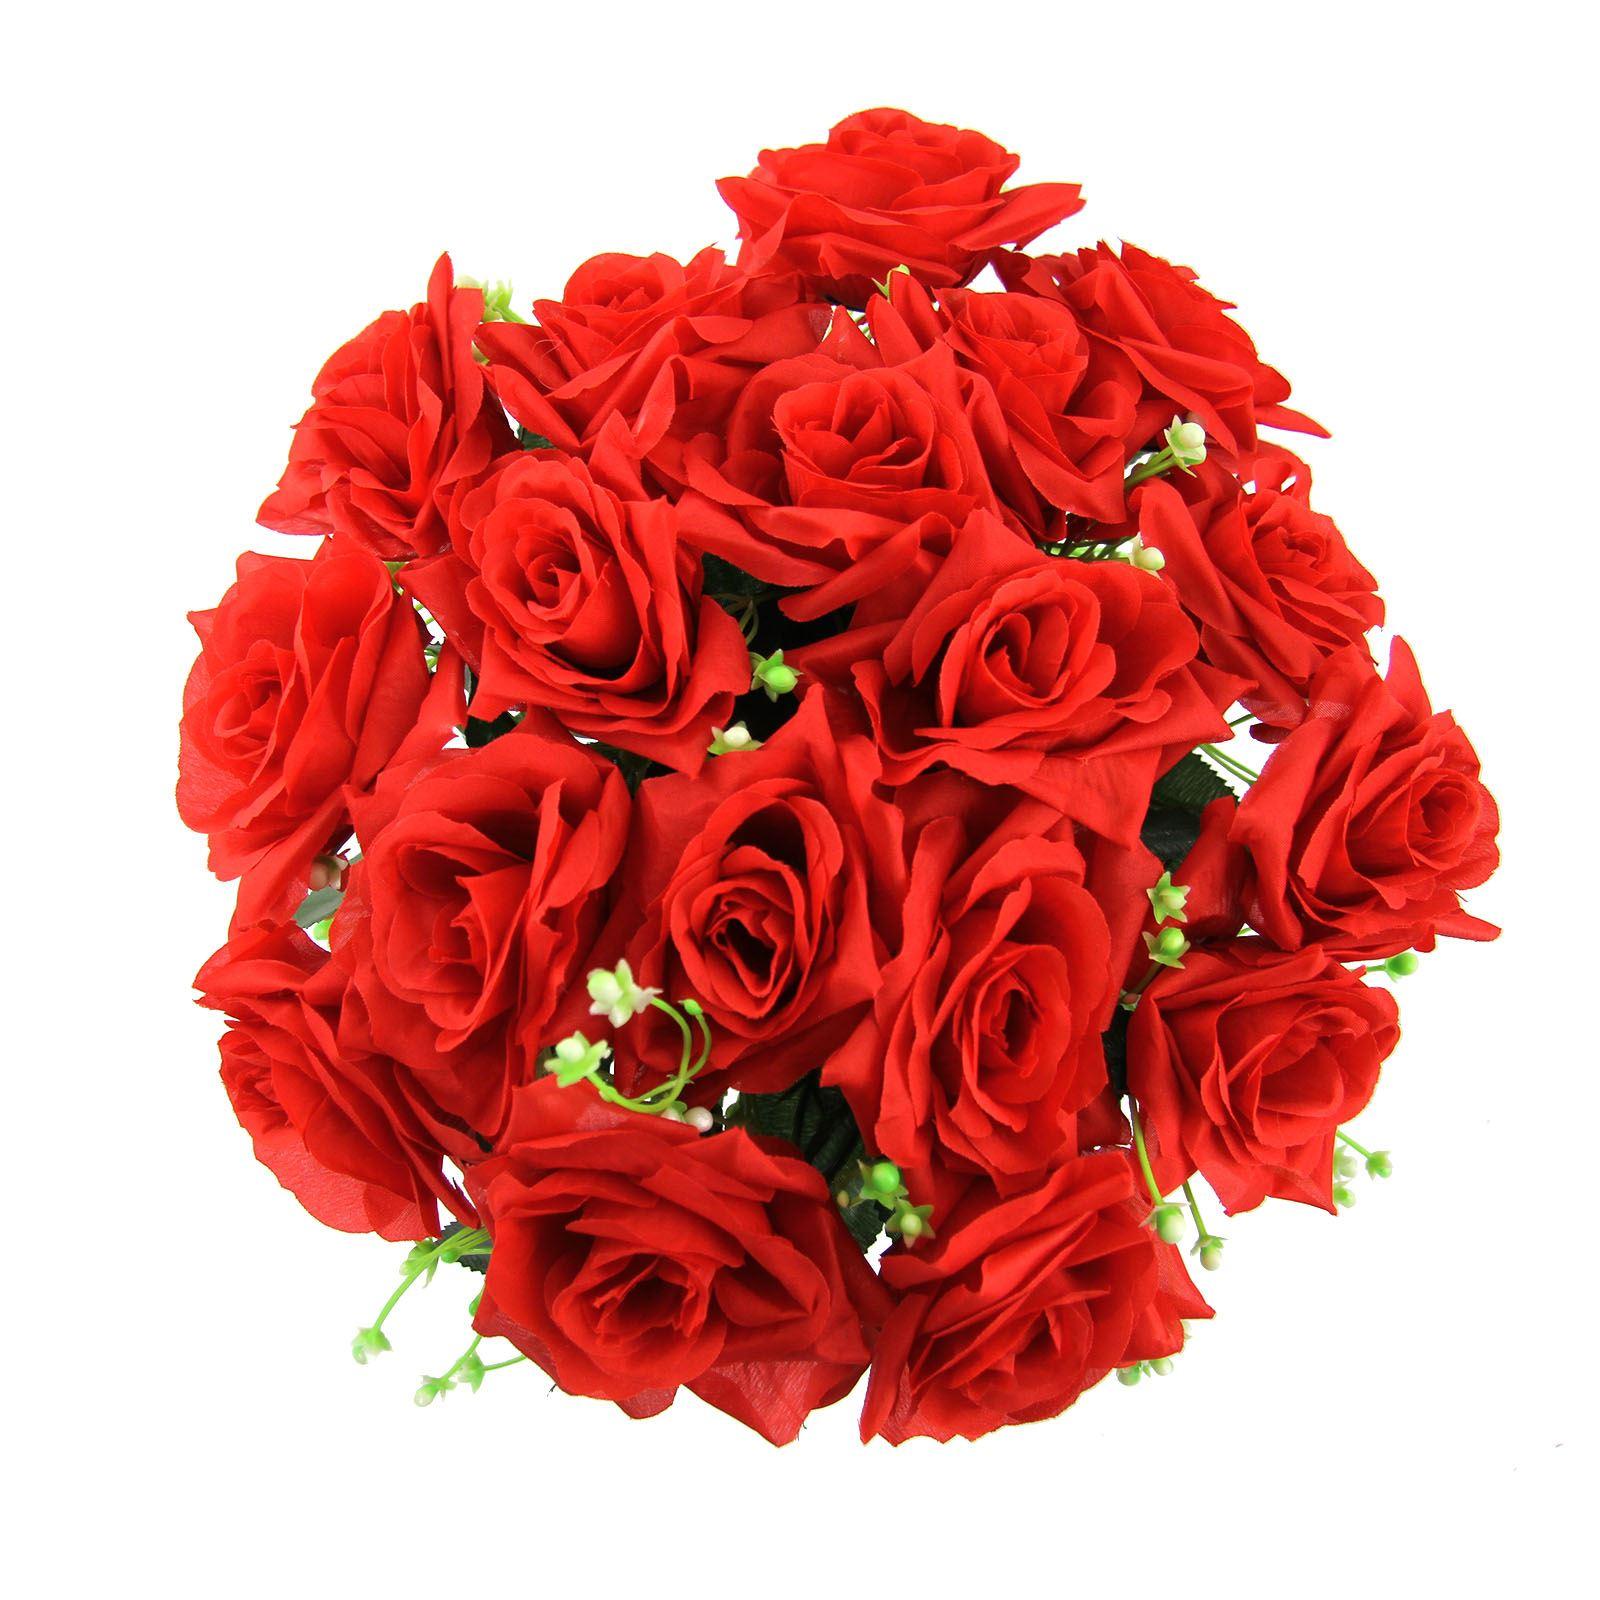 Xl 18 head open rose bouquet large premium fake silk artificial picture 5 of 7 izmirmasajfo